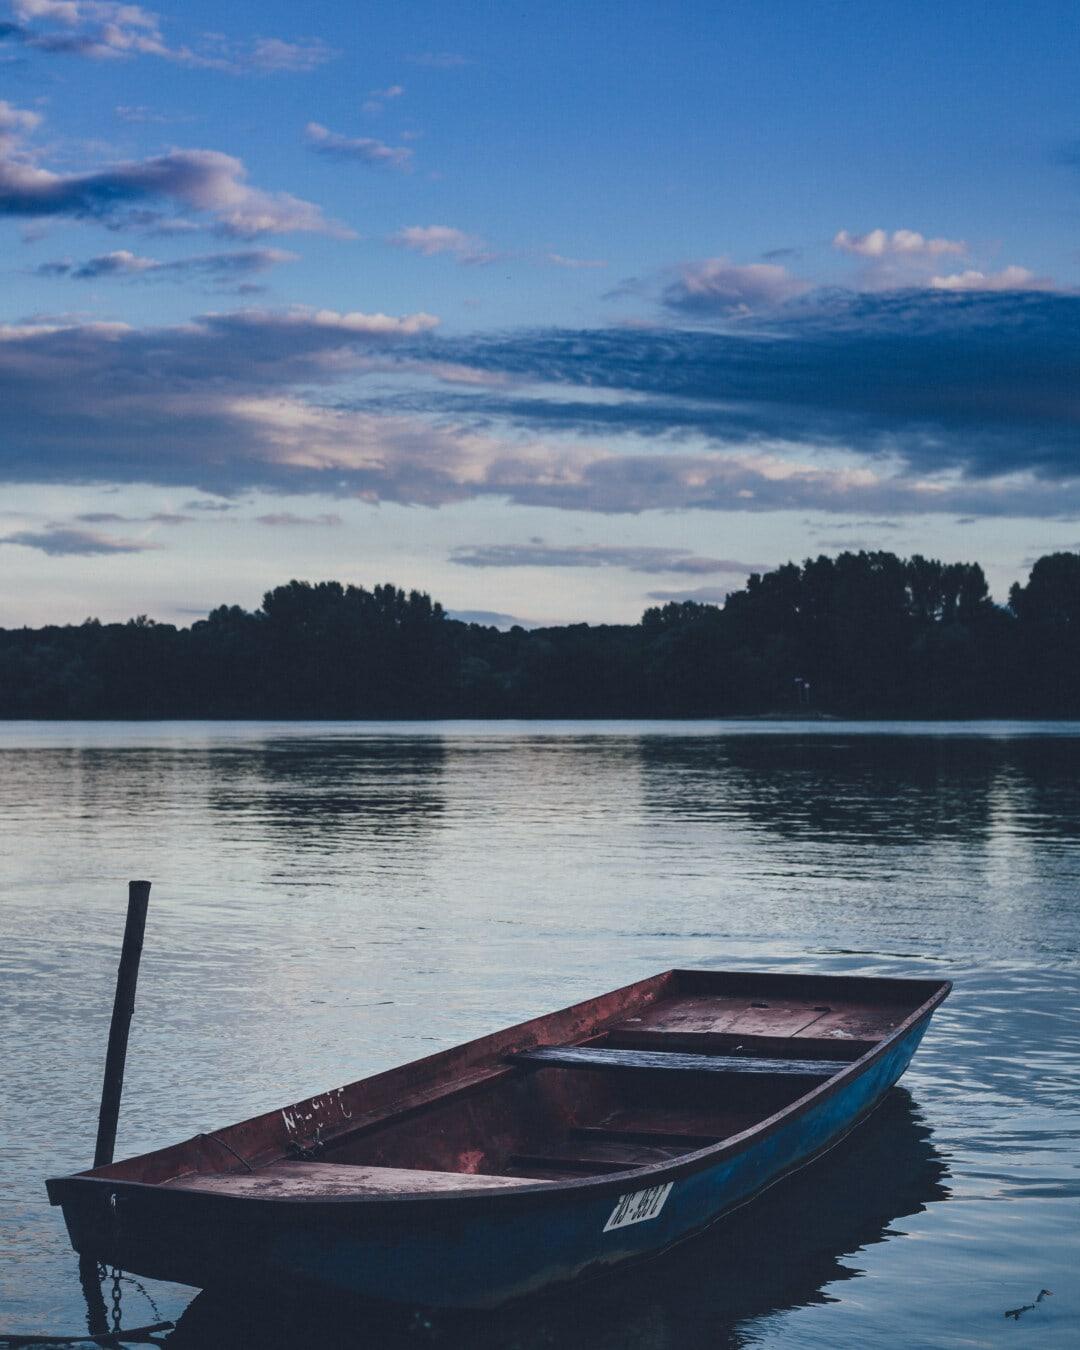 søen, båd, vand, landskab, refleksion, sommer, solnedgang, floden, bådene, naturskønne